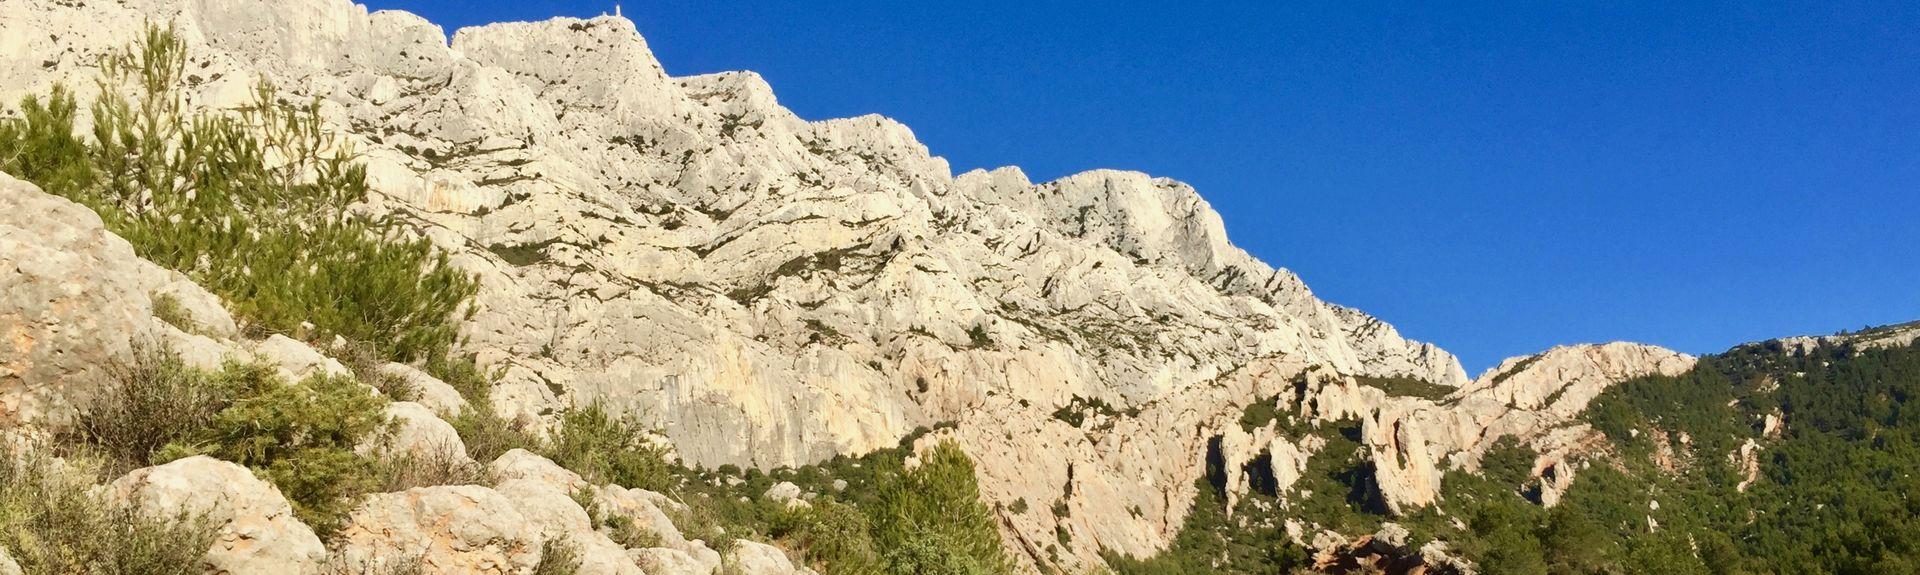 Couronne Urbaine, Aix-en-Provence, Provenza-Alpi-Costa Azzurra, Francia